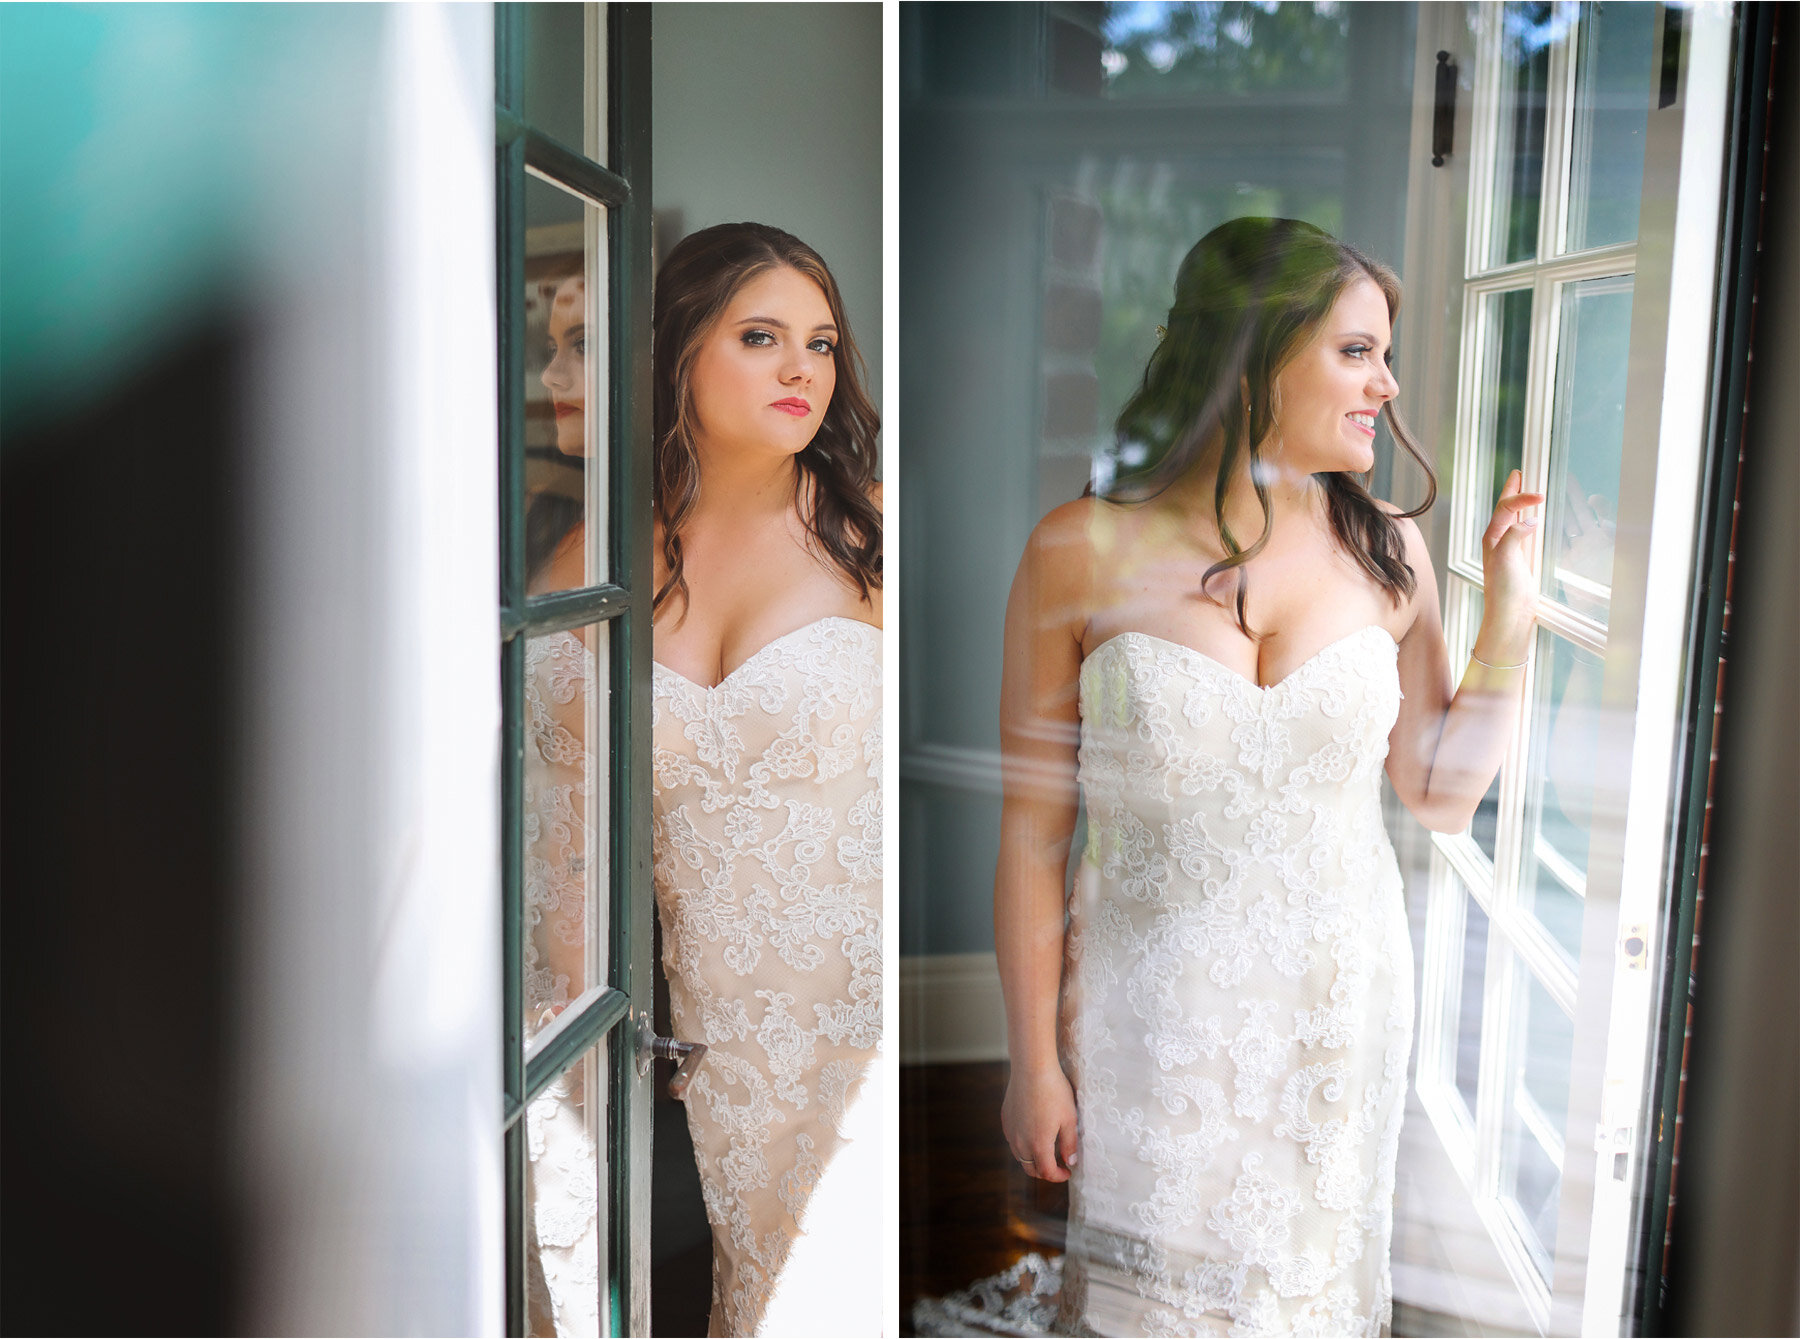 03-Vick-Photography-Wedding-Minnetonka-Minnesota-Family-Home-Bride-Katie-and-David.jpg